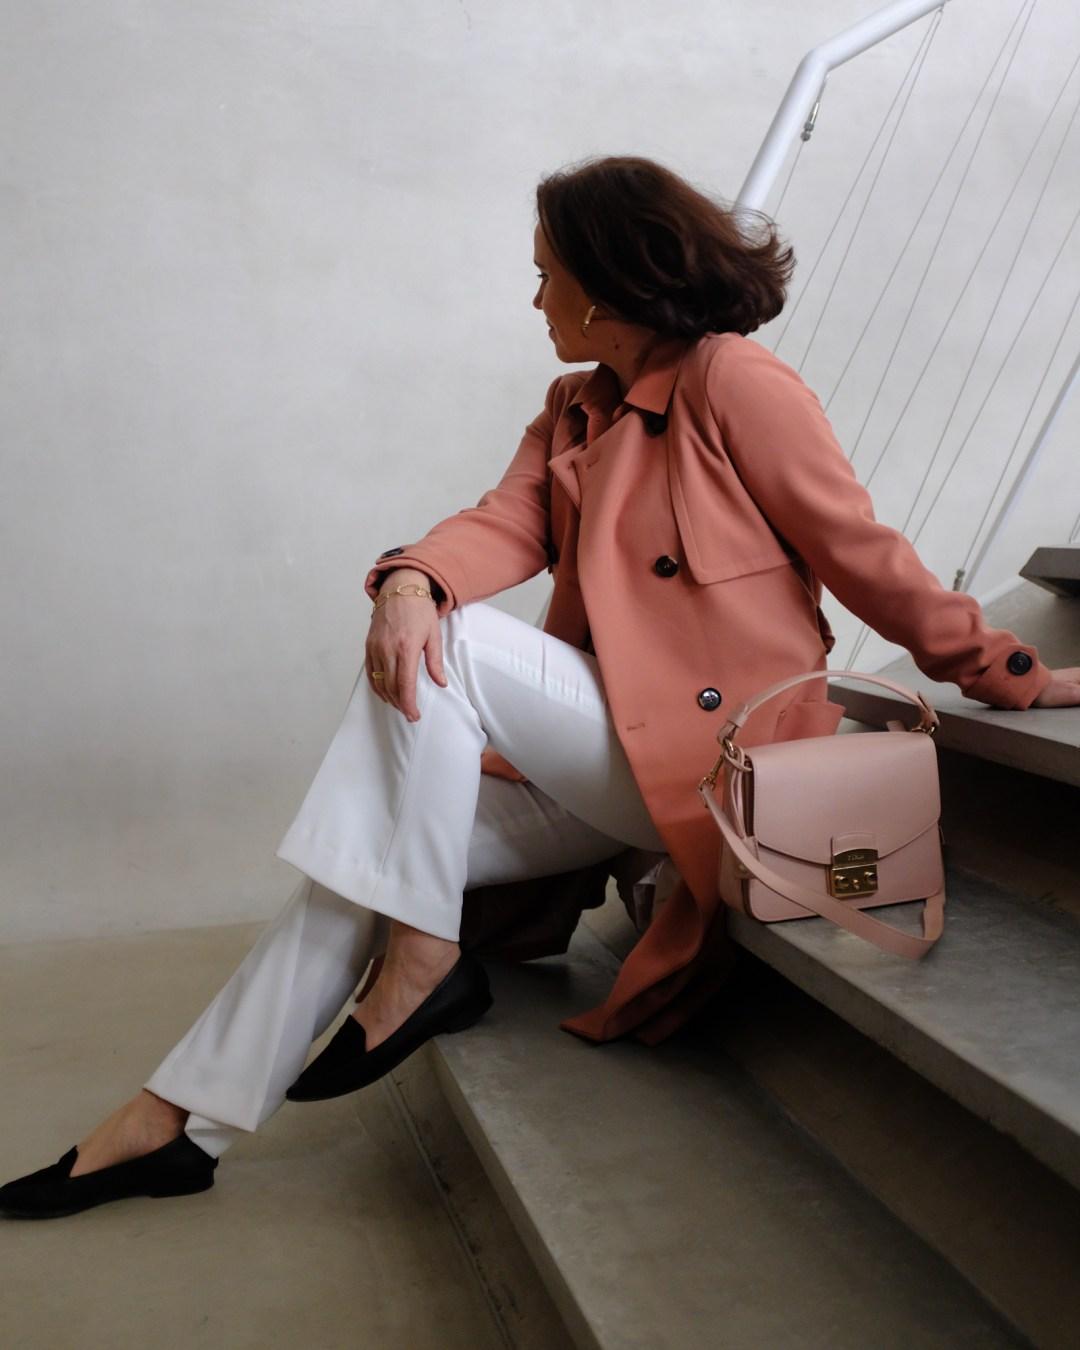 inastil, Trenchcoat, Springcoat, Frühjahrsmode, Stilberatung, Ü50Mode, Modeberatung, Frühlingsfarben, Modeblogger-15